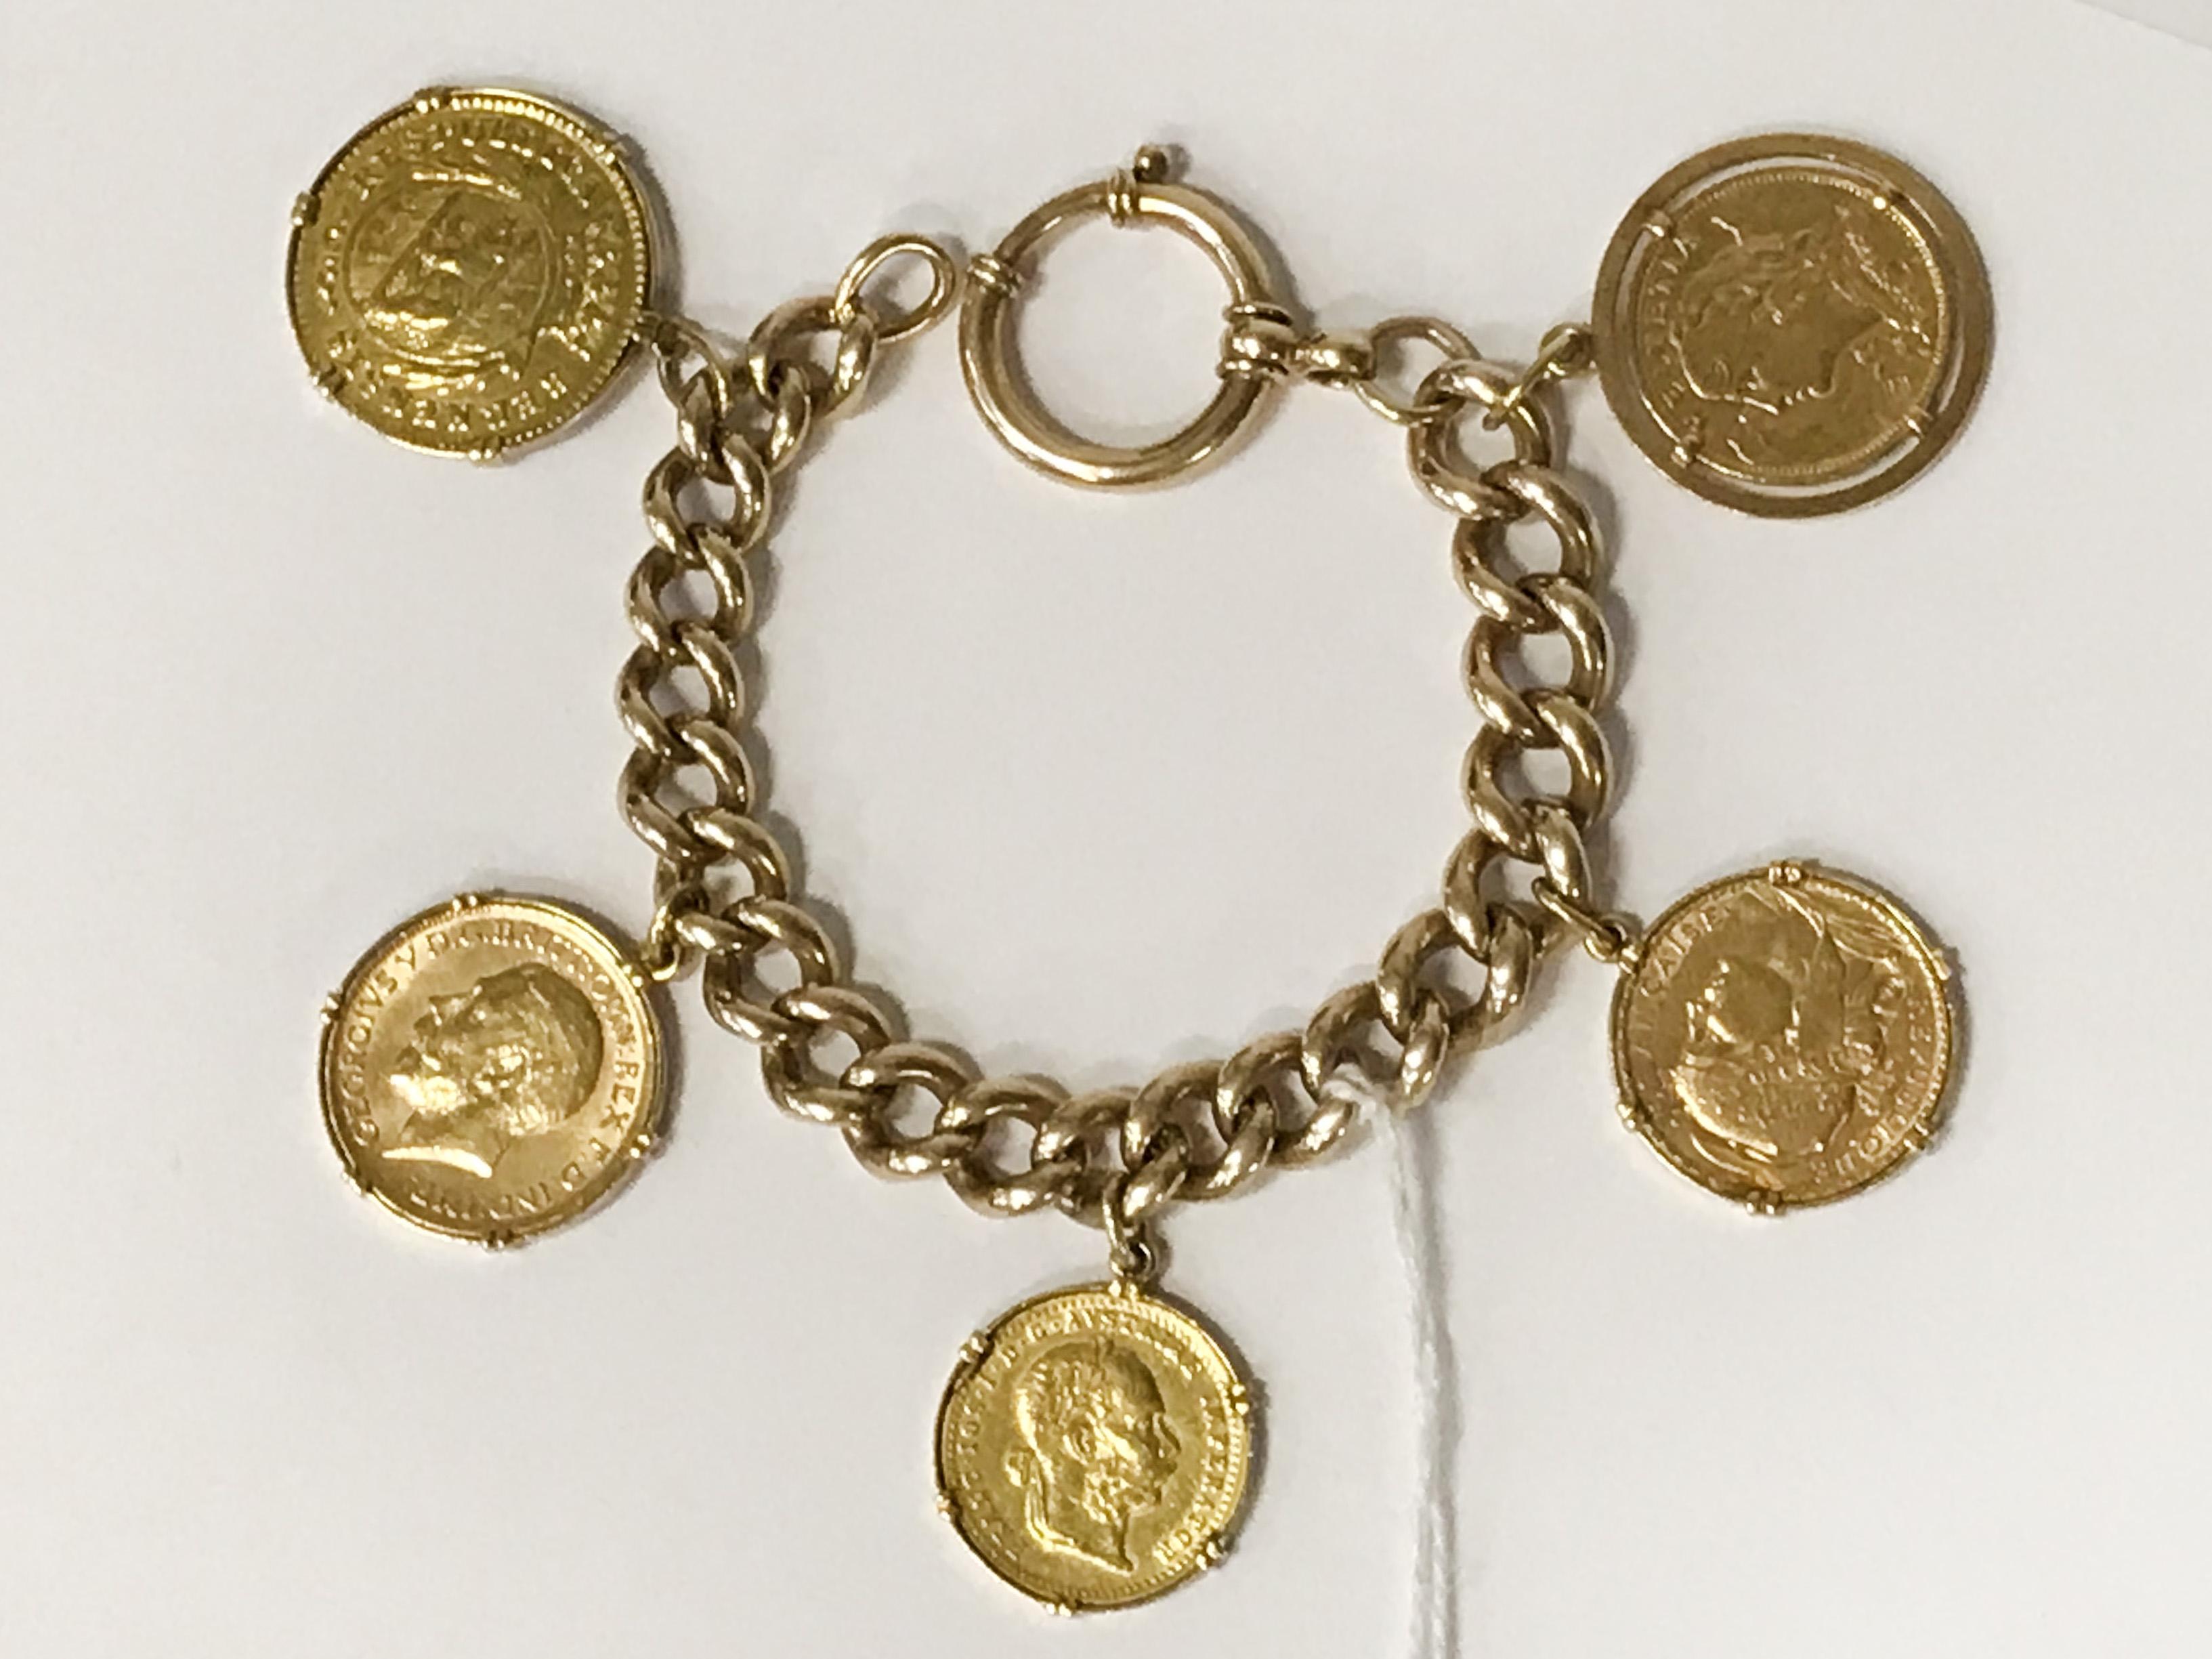 VINTAGE MULTO GOLD COINS BRACELET - 2 X 20 SWISS FRANC COINS, 1 AUSTRIAN DUCAT, 1 FULL SOVEREIGN,